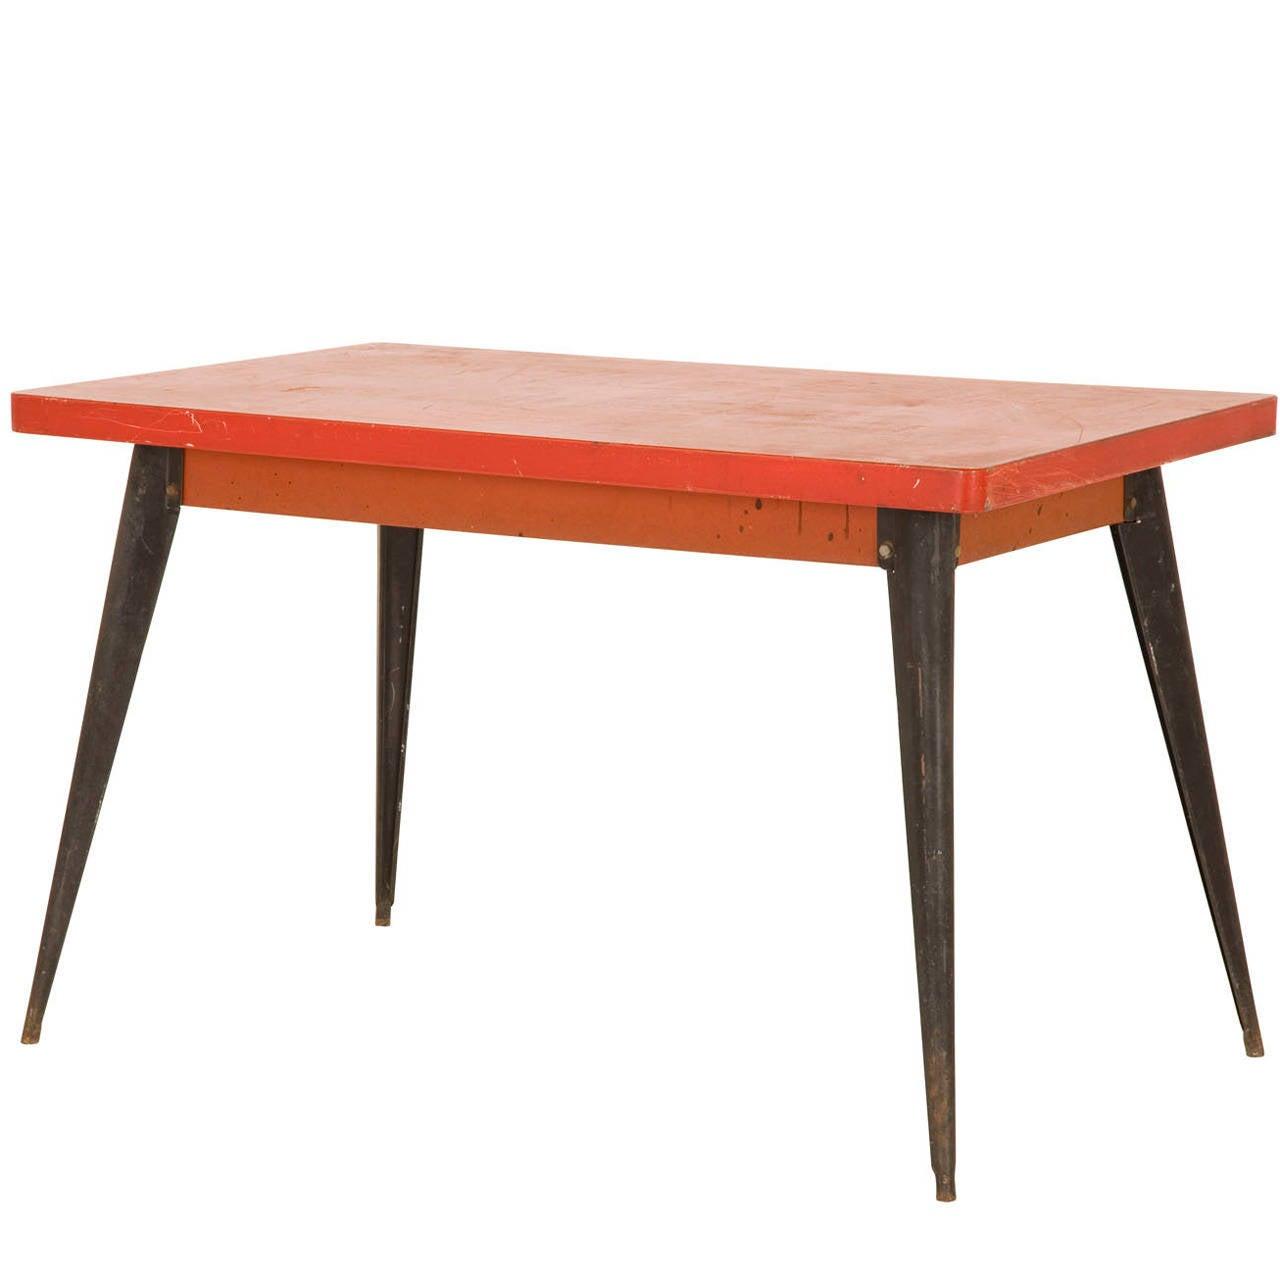 Vintage metal tolix bistro table at 1stdibs for Table exterieur tolix